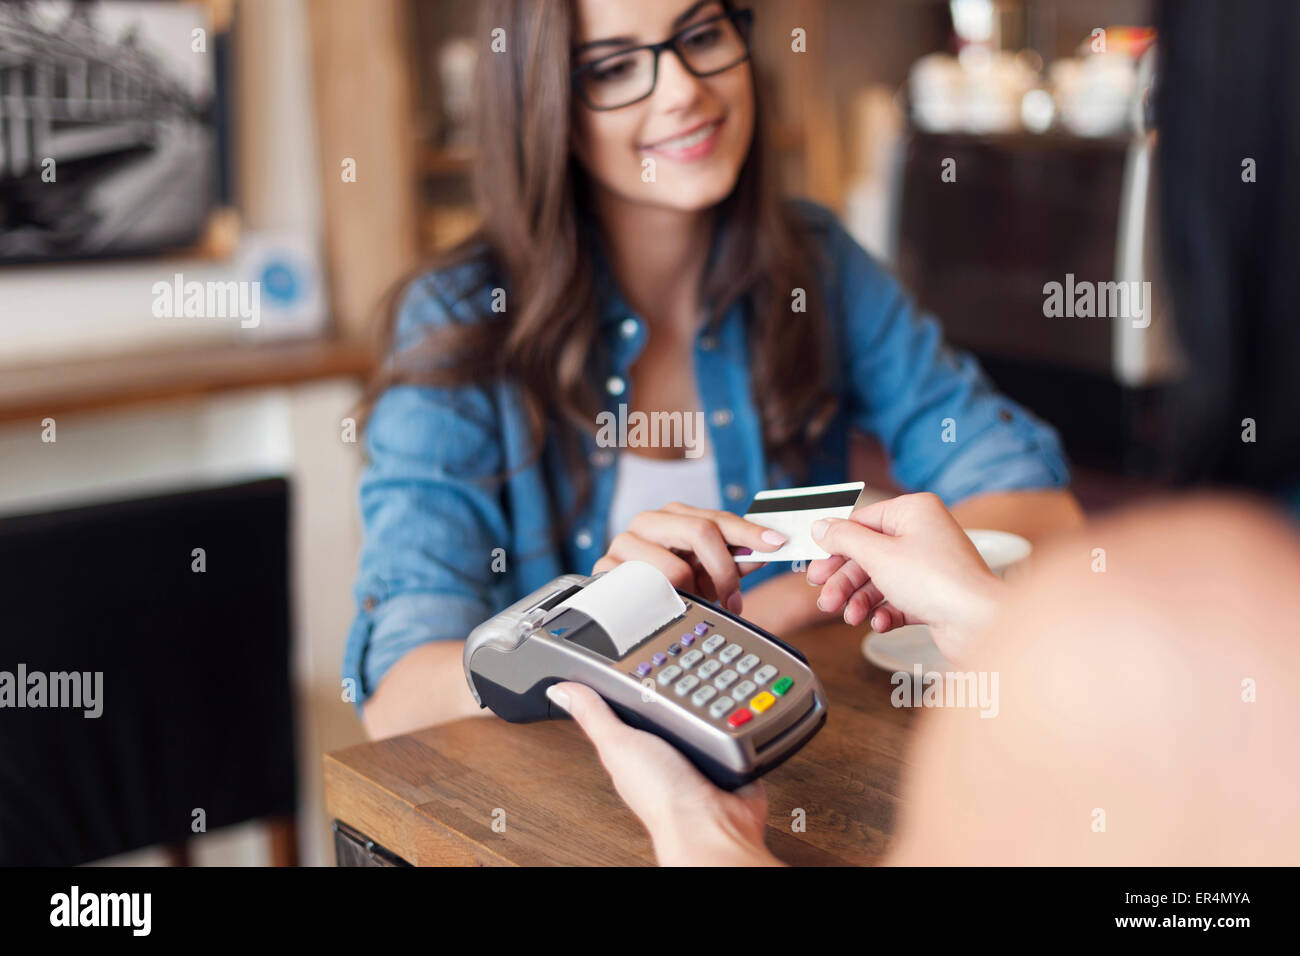 Mujer sonriente café pagando con tarjeta de crédito. Cracovia, Polonia Imagen De Stock